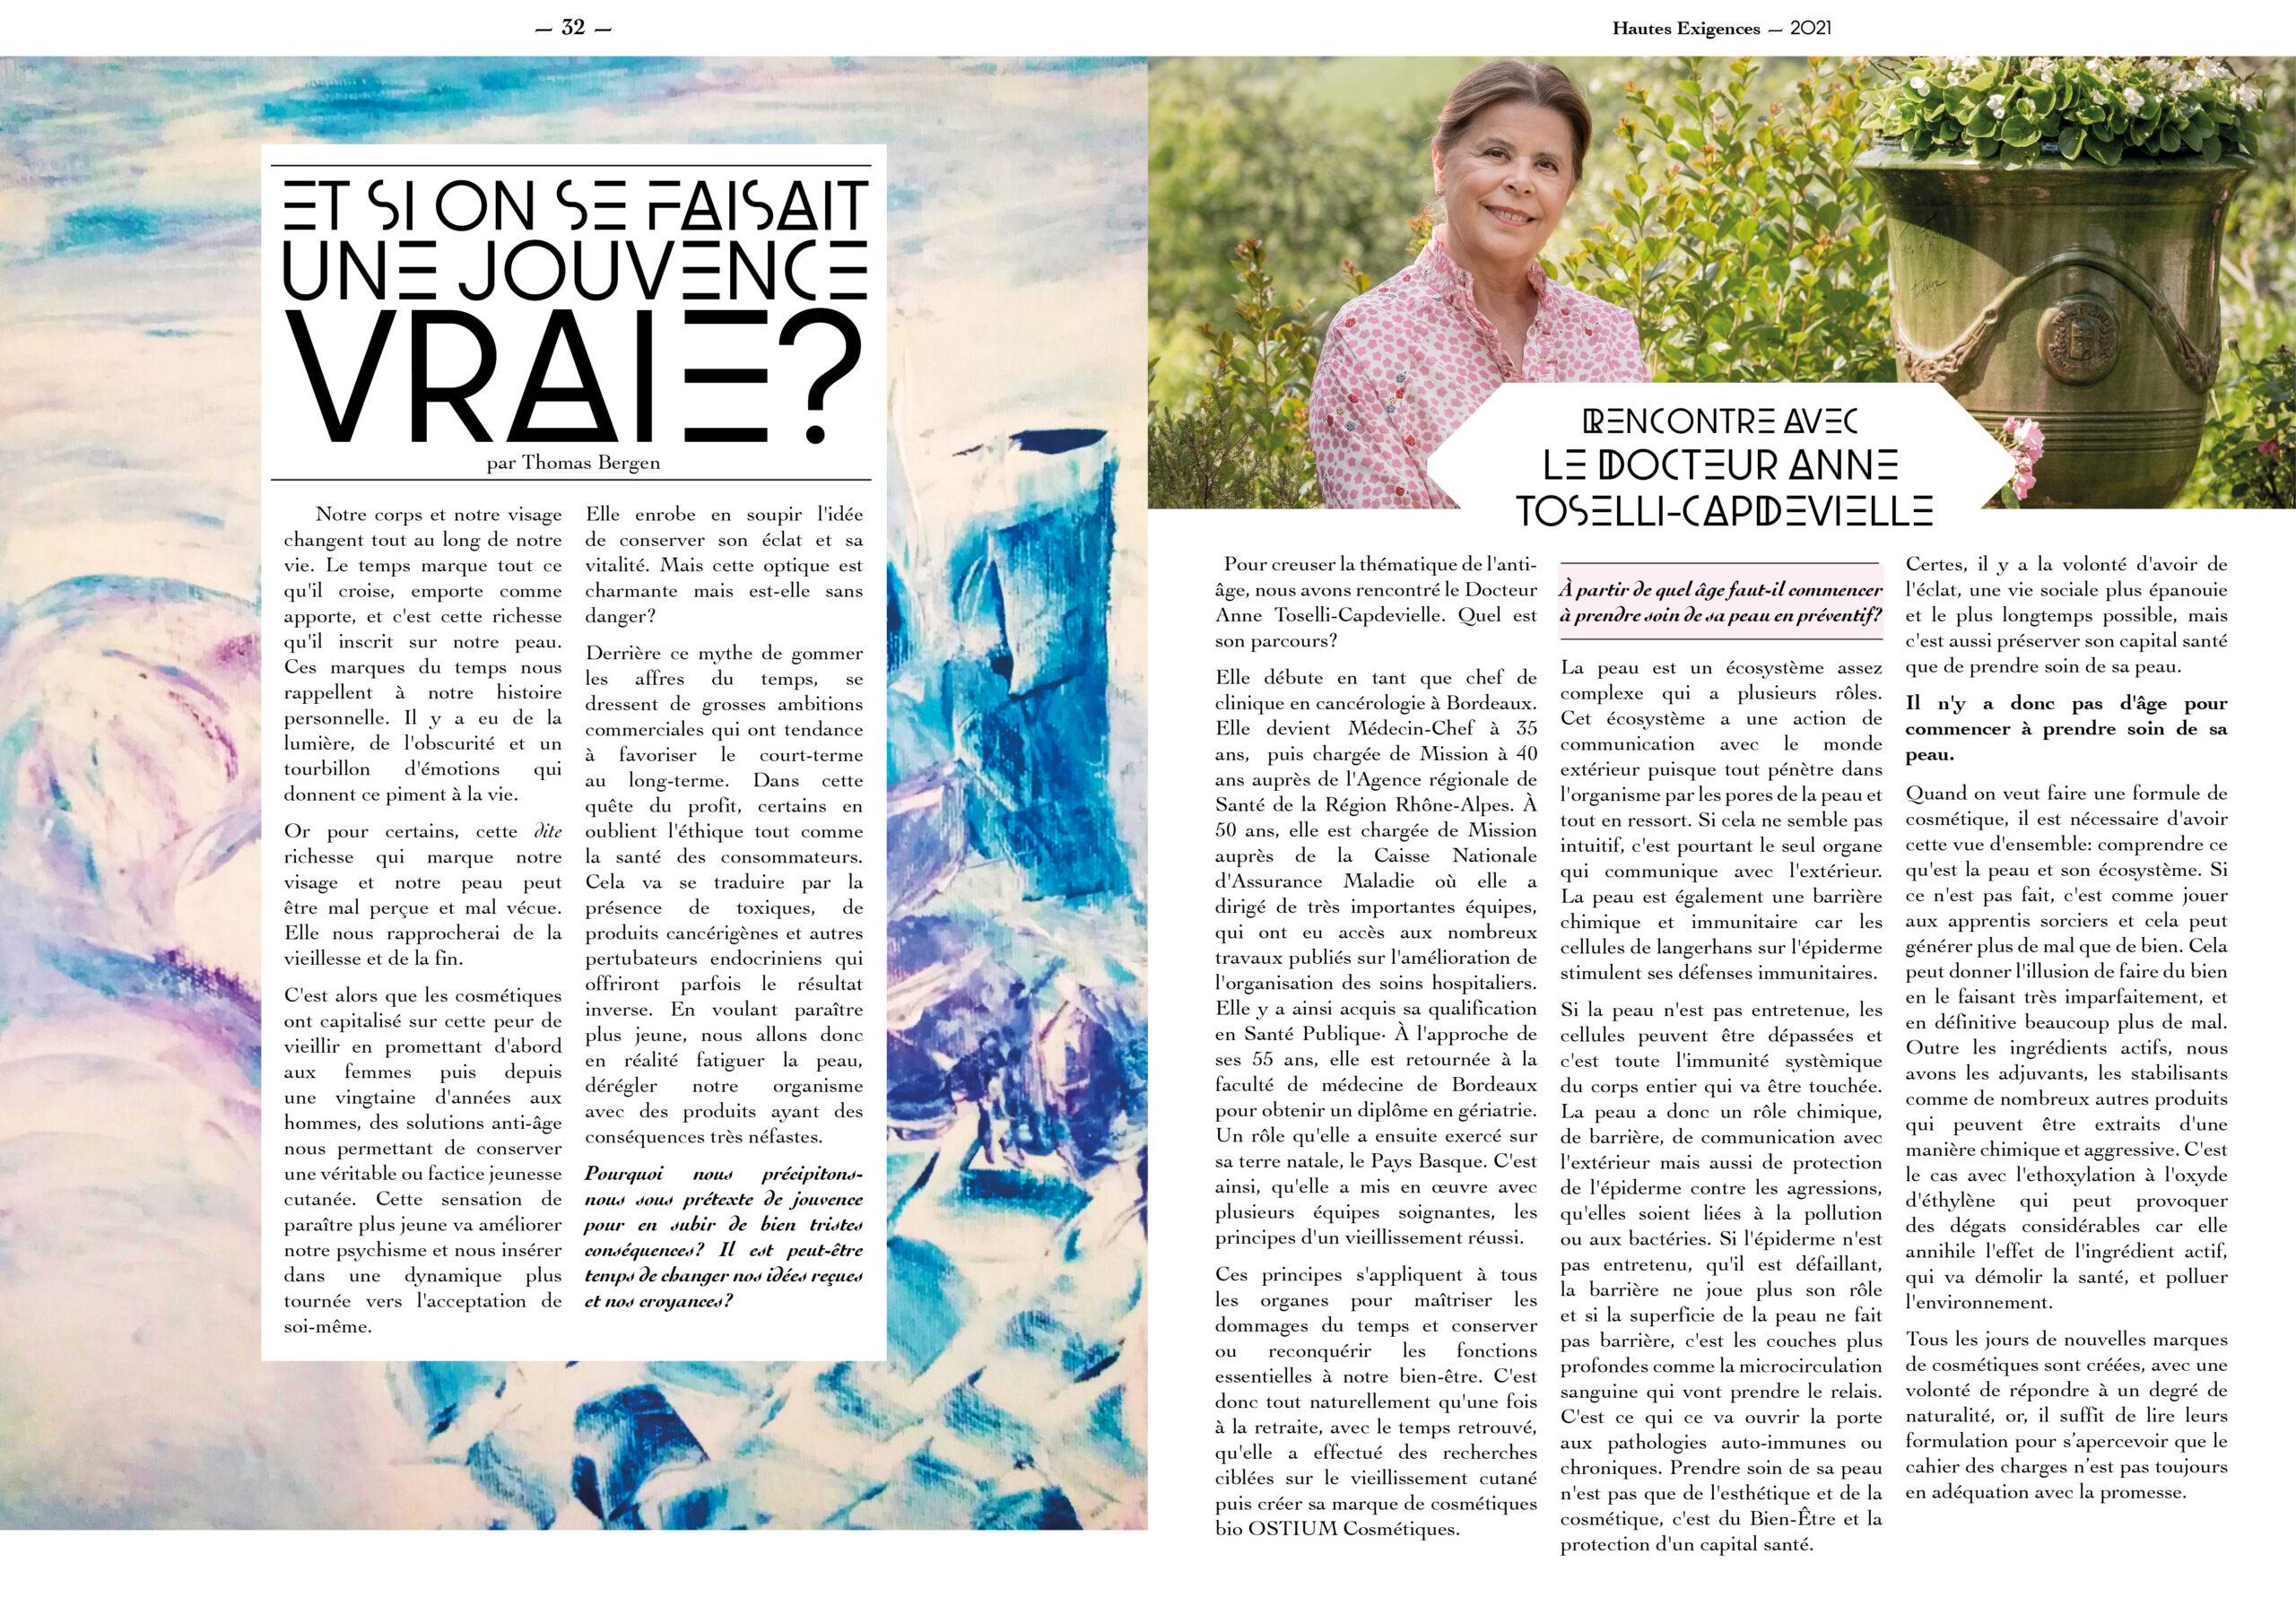 Hautes Exigences Magazine Hors Serie 2021 page 32-33